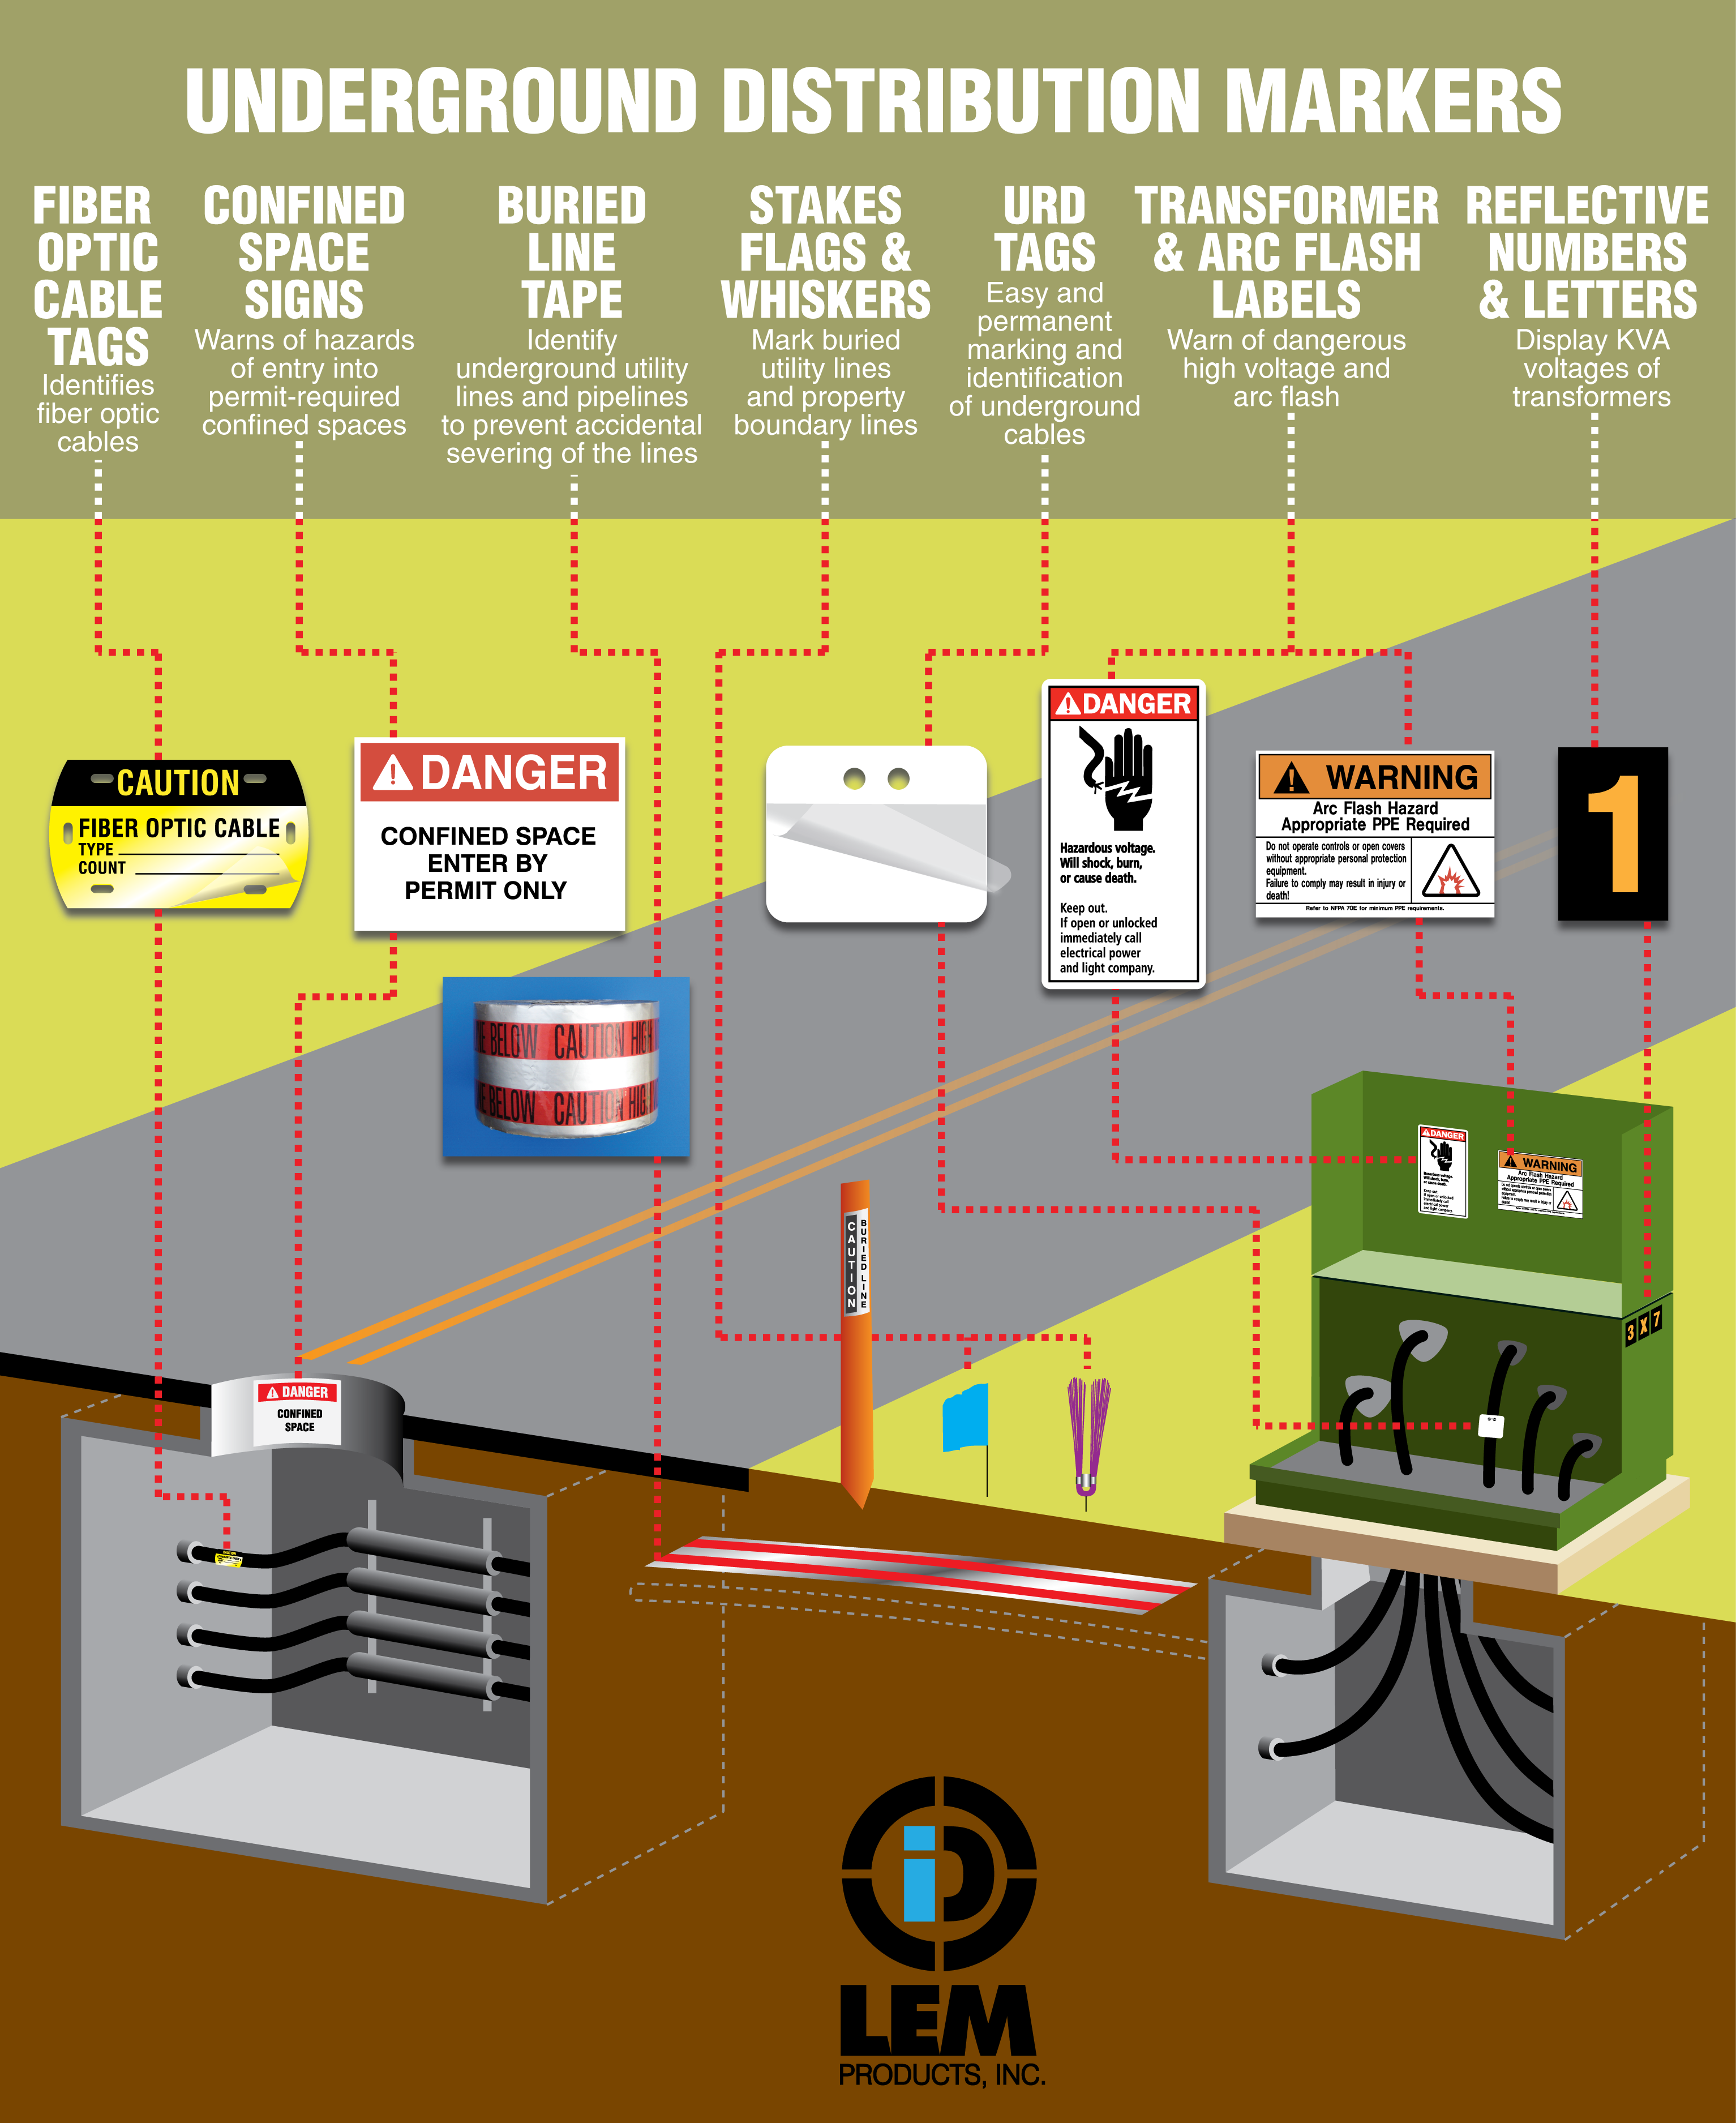 Underground distribution throughout the powergrid